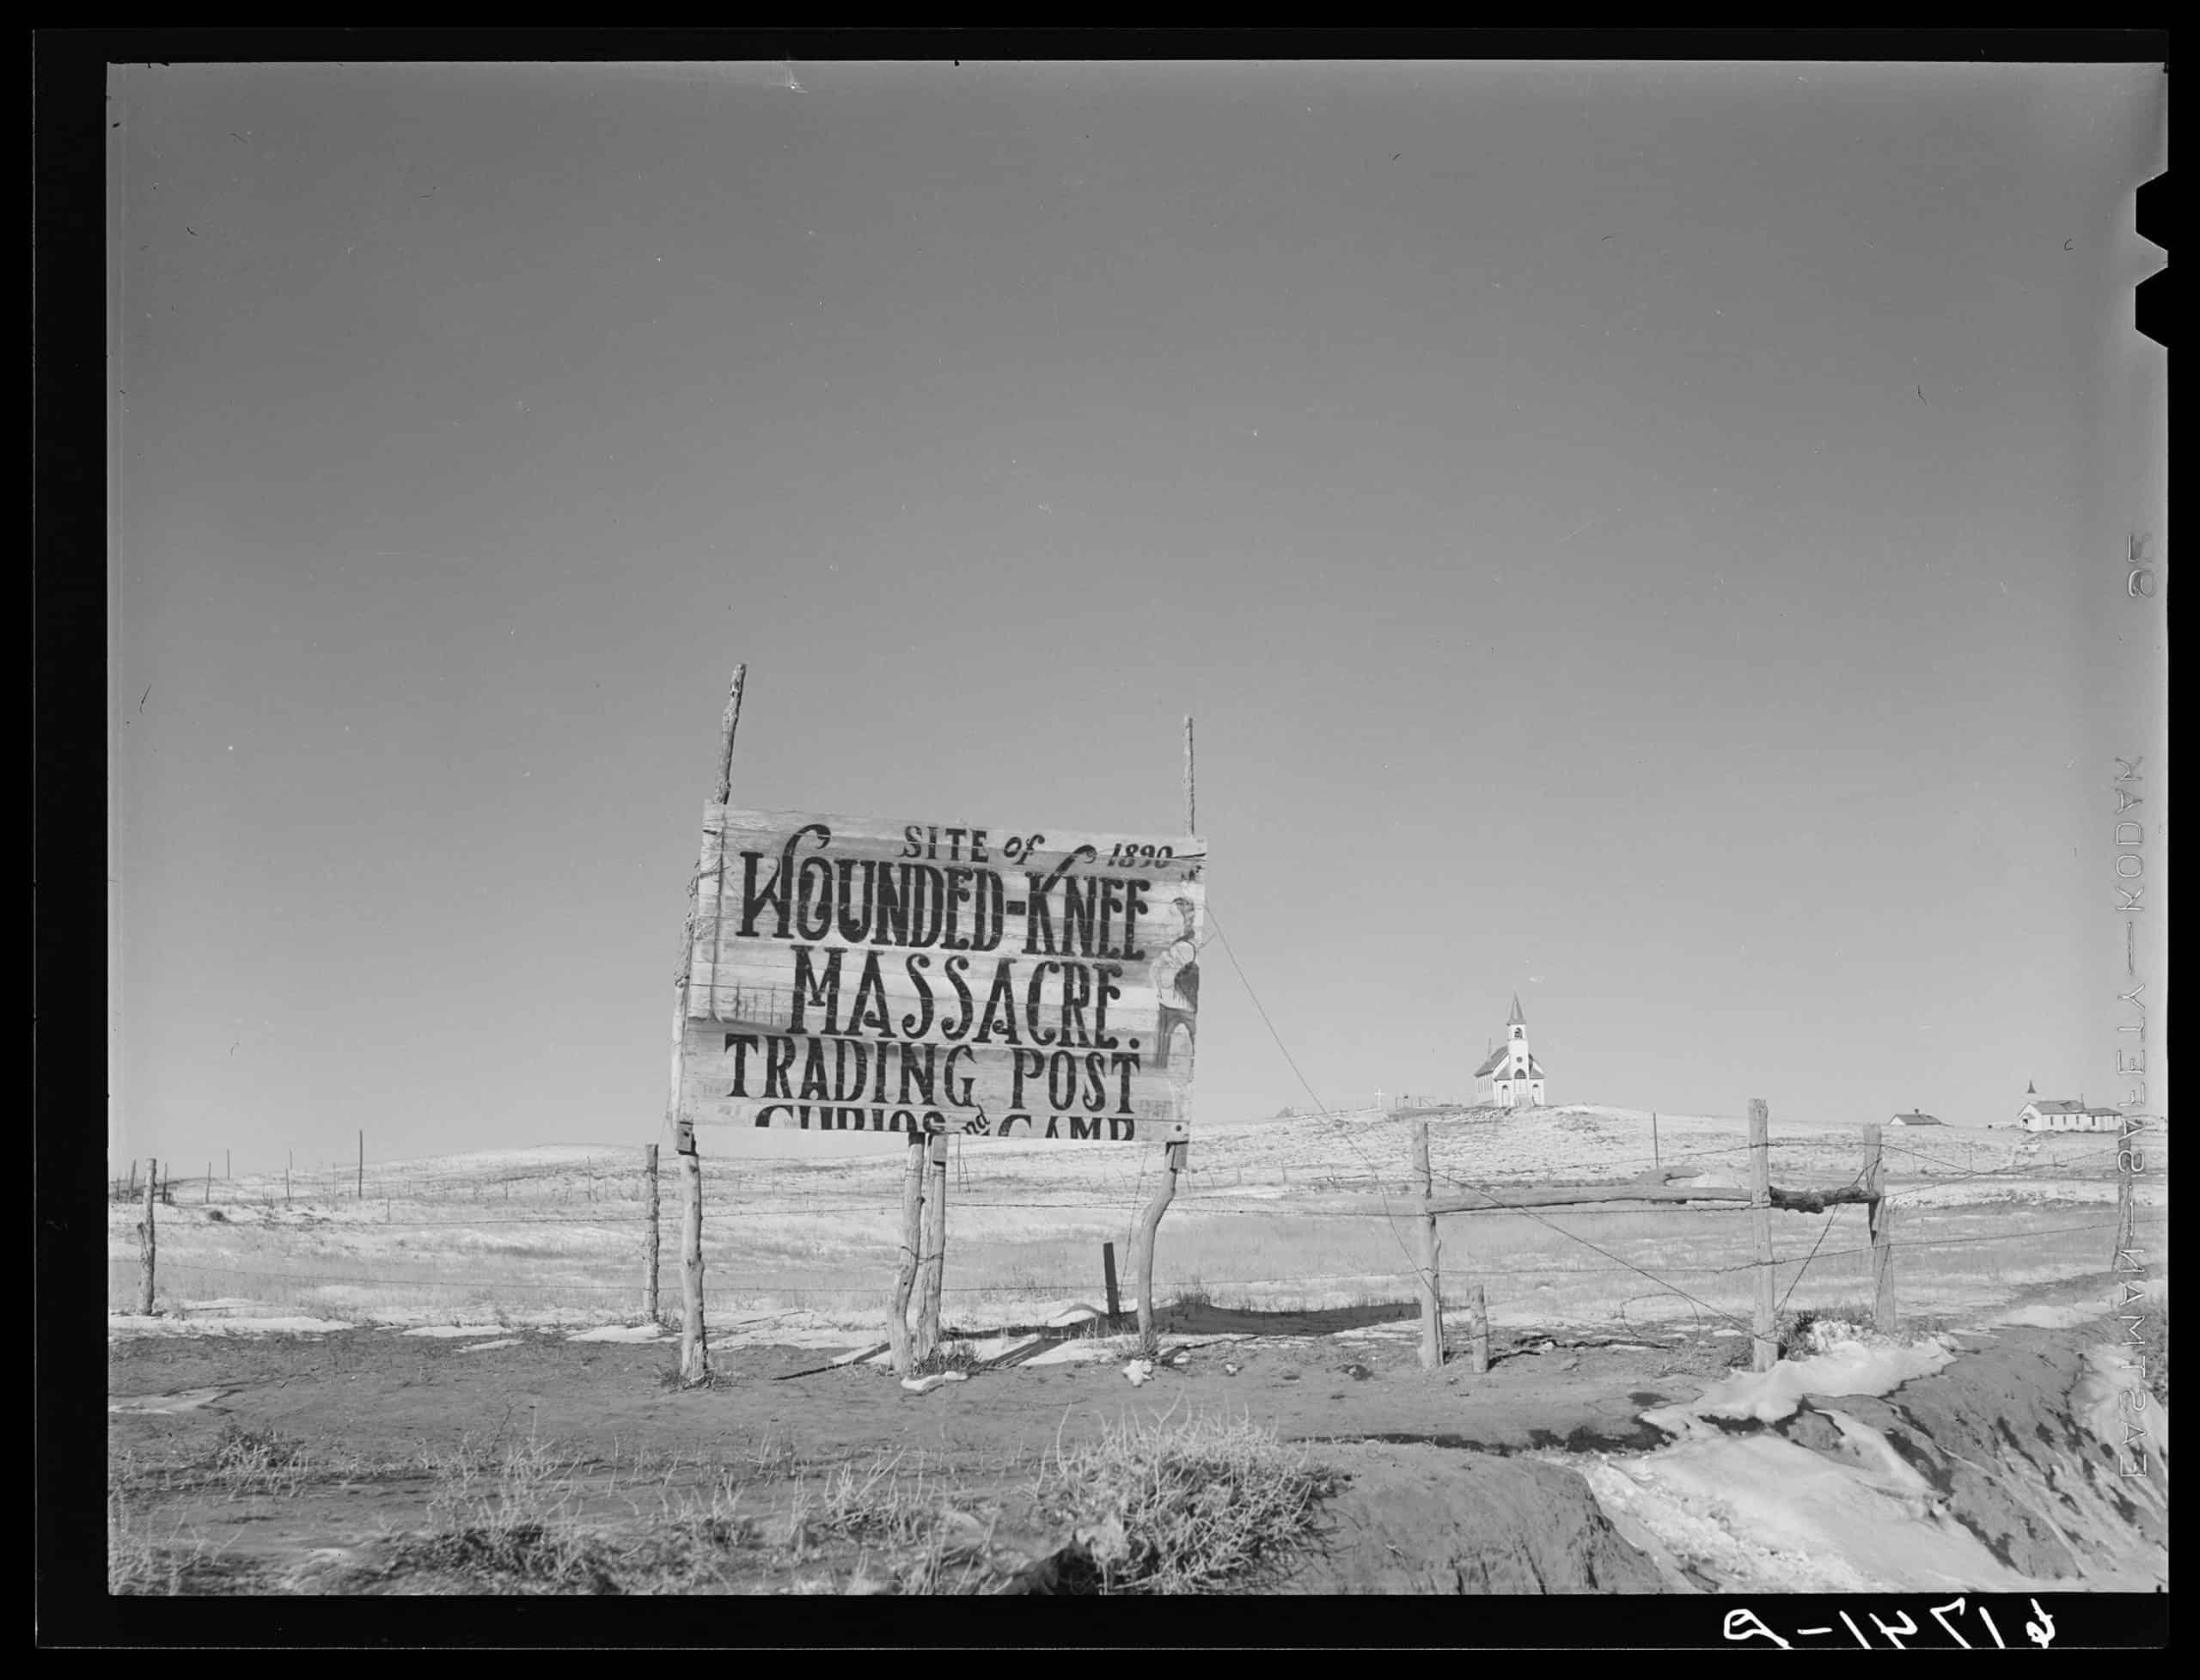 Church at Wounded Knee, South Dakota, John Vachon, 1940